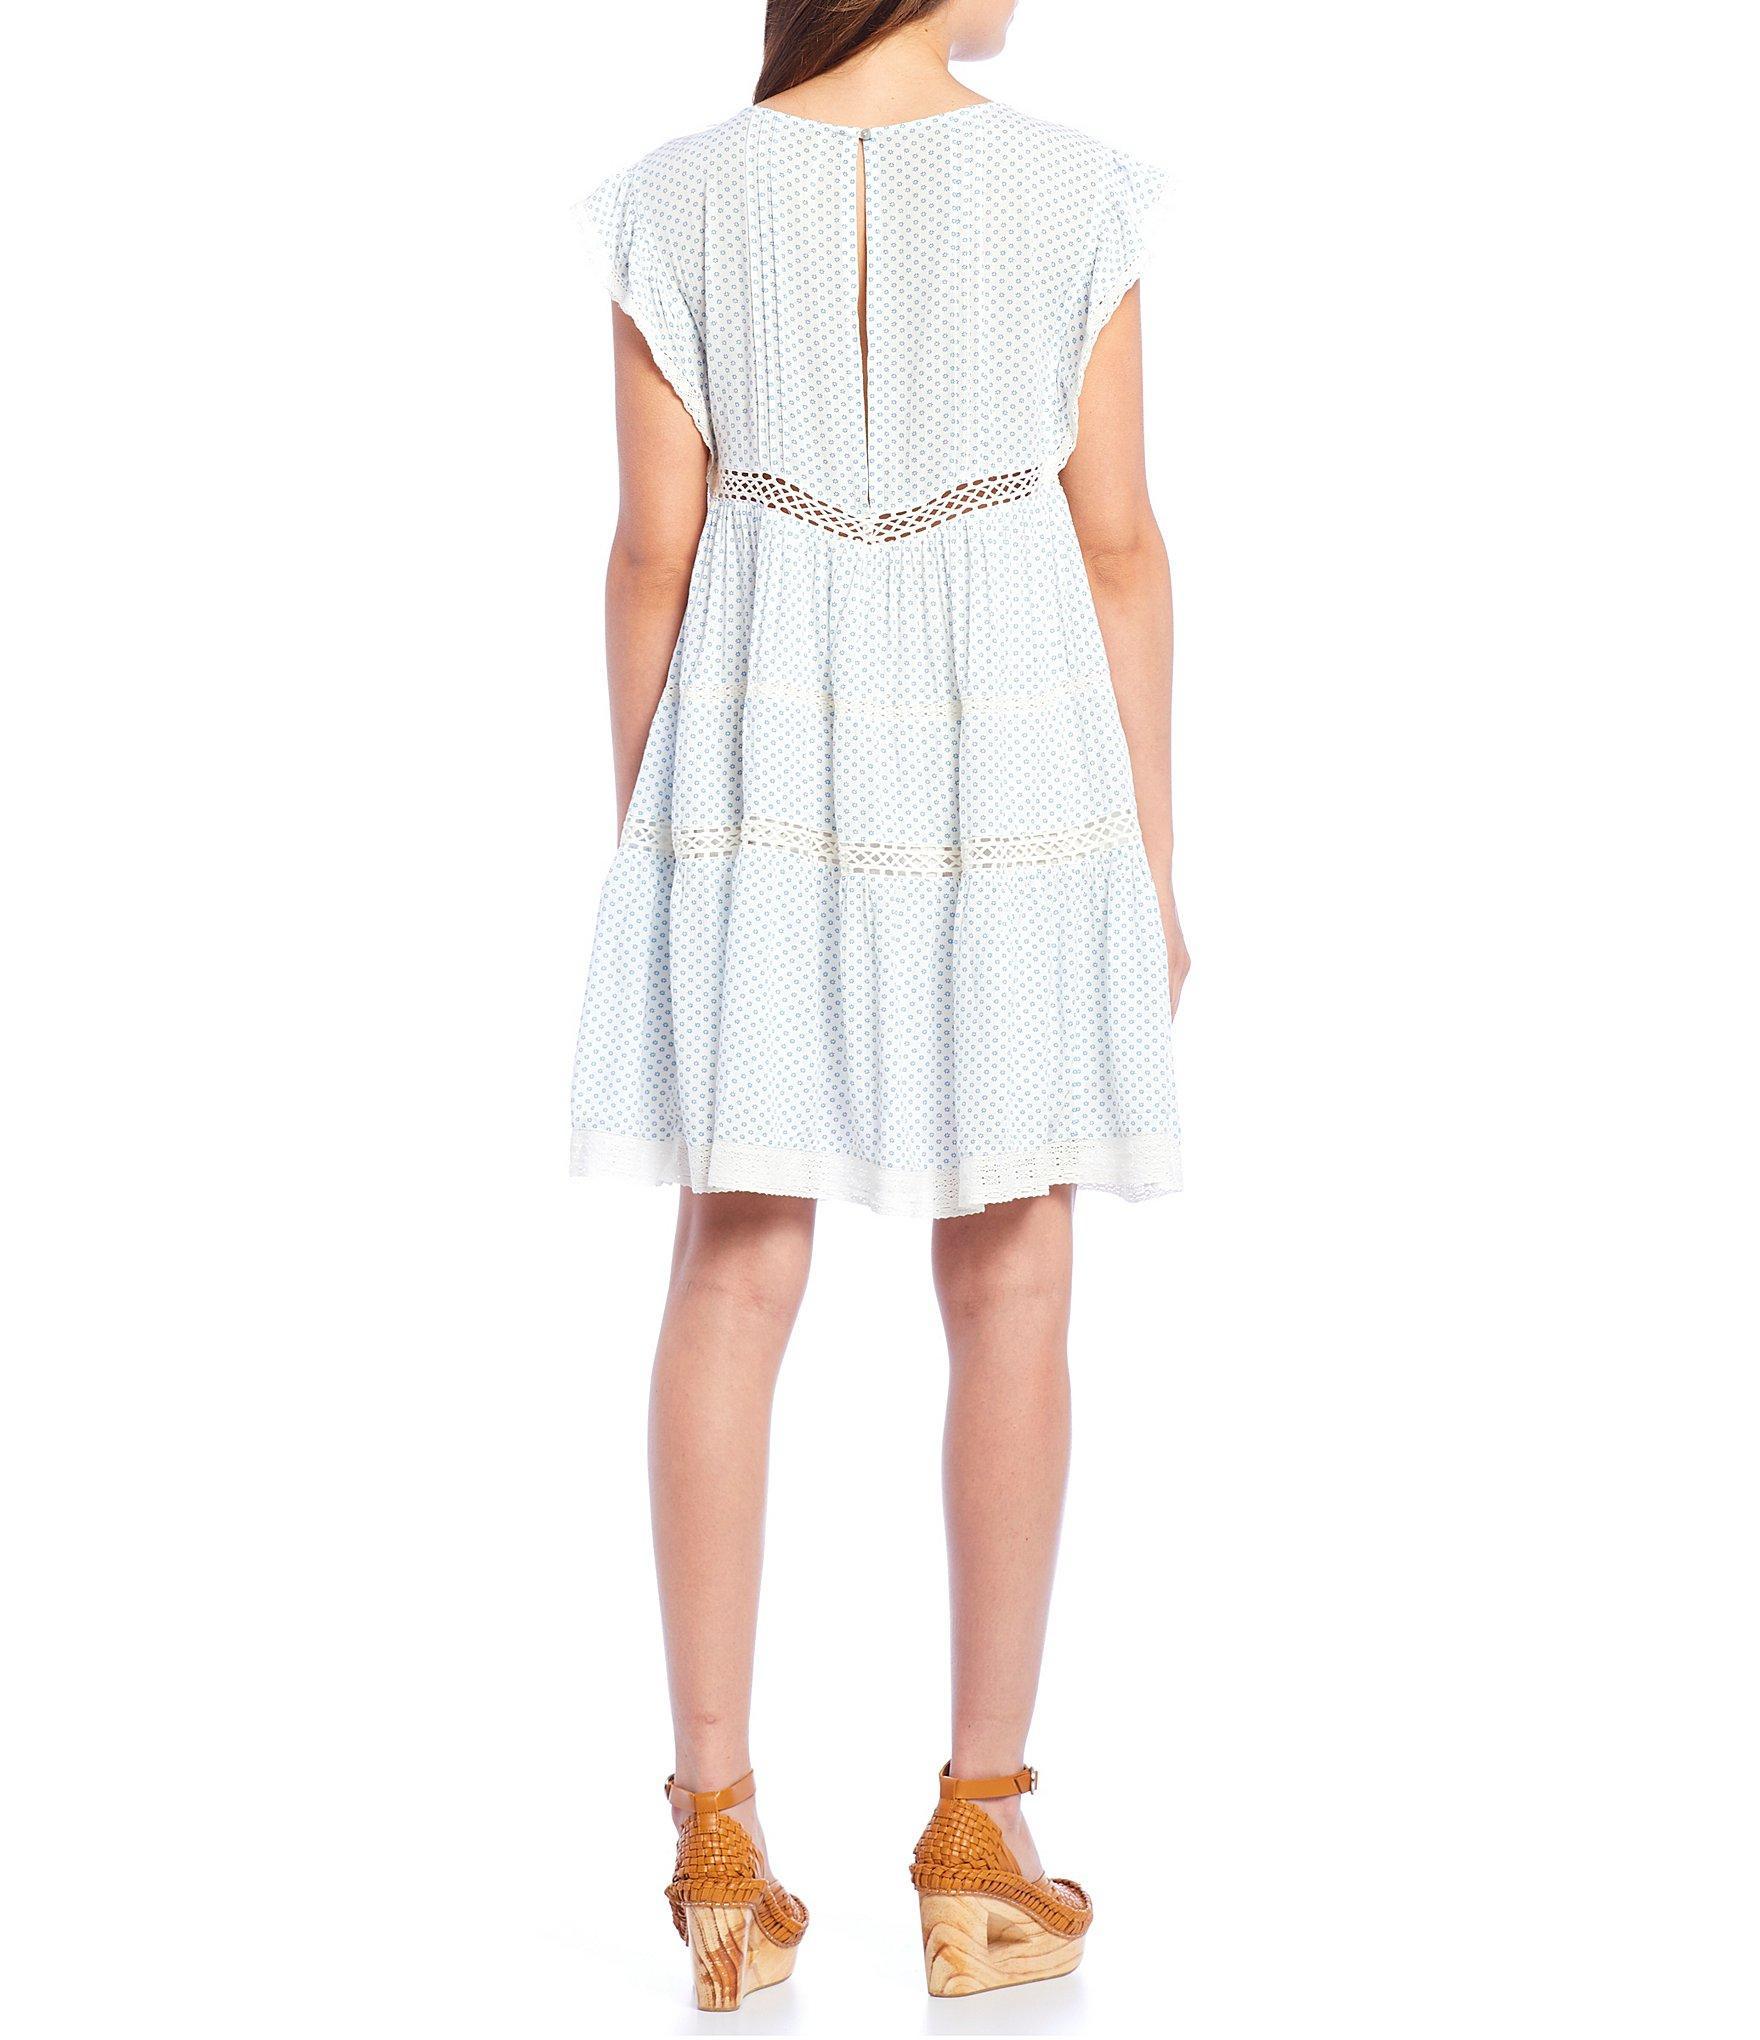 d88c353aca45 Free People - White Retro Kitty Crochet Detail Cap Sleeve Dress - Lyst.  View fullscreen